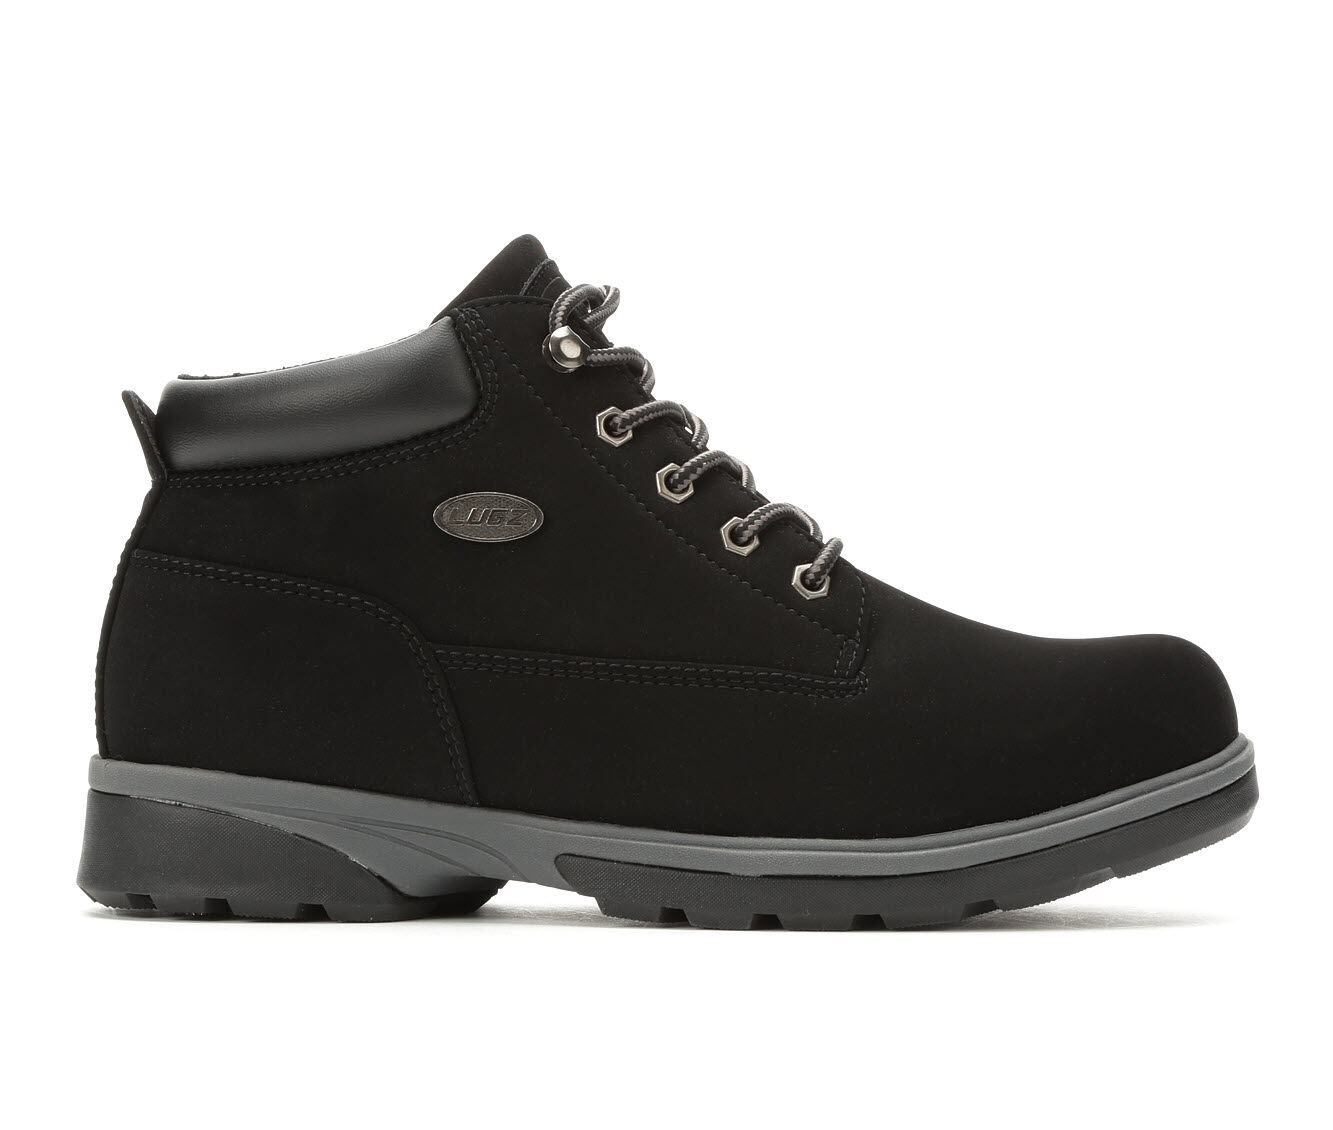 Men's Lugz Drifter Zeolite Mid Boots Black/Charcoal